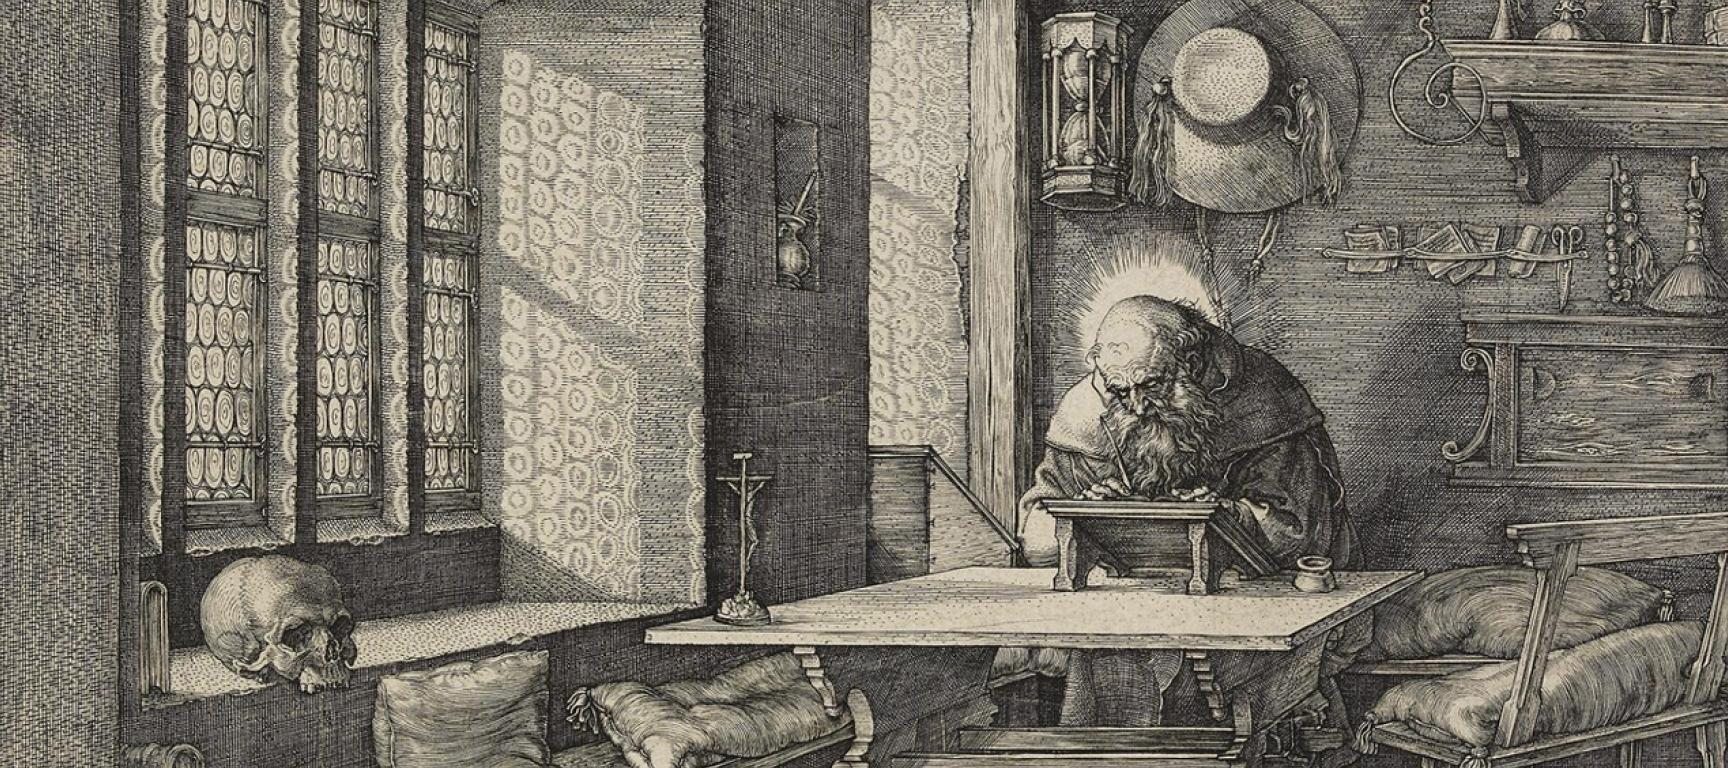 Albrecht Dürer Renaissance Etching, Saint Jerome in His Study 1514